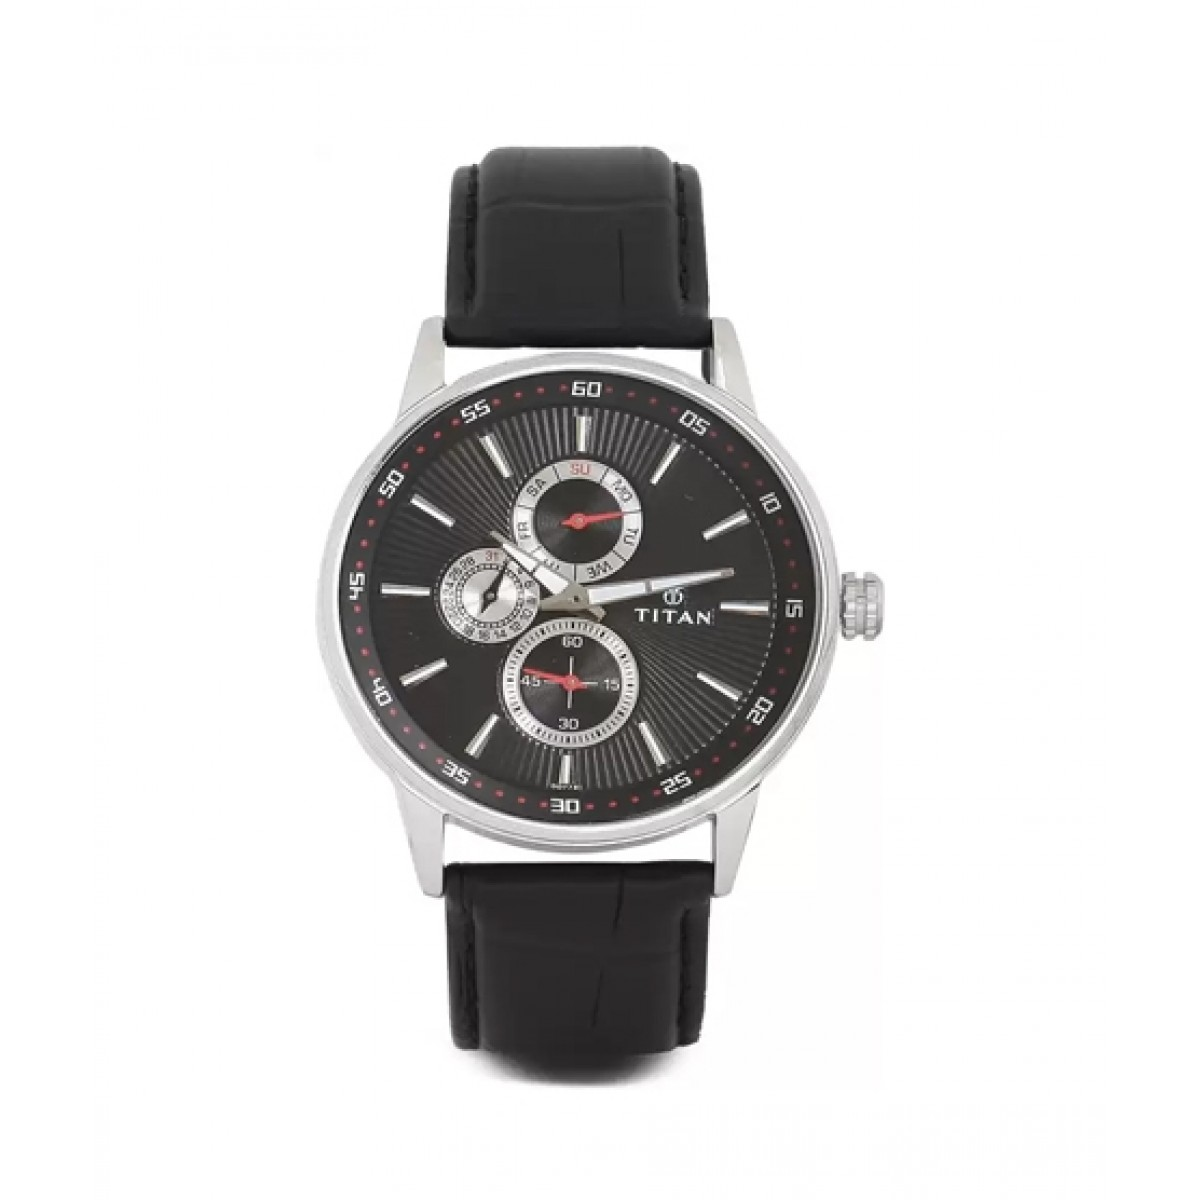 Titan Smart Steel Men's Watch Black (9441SL02)